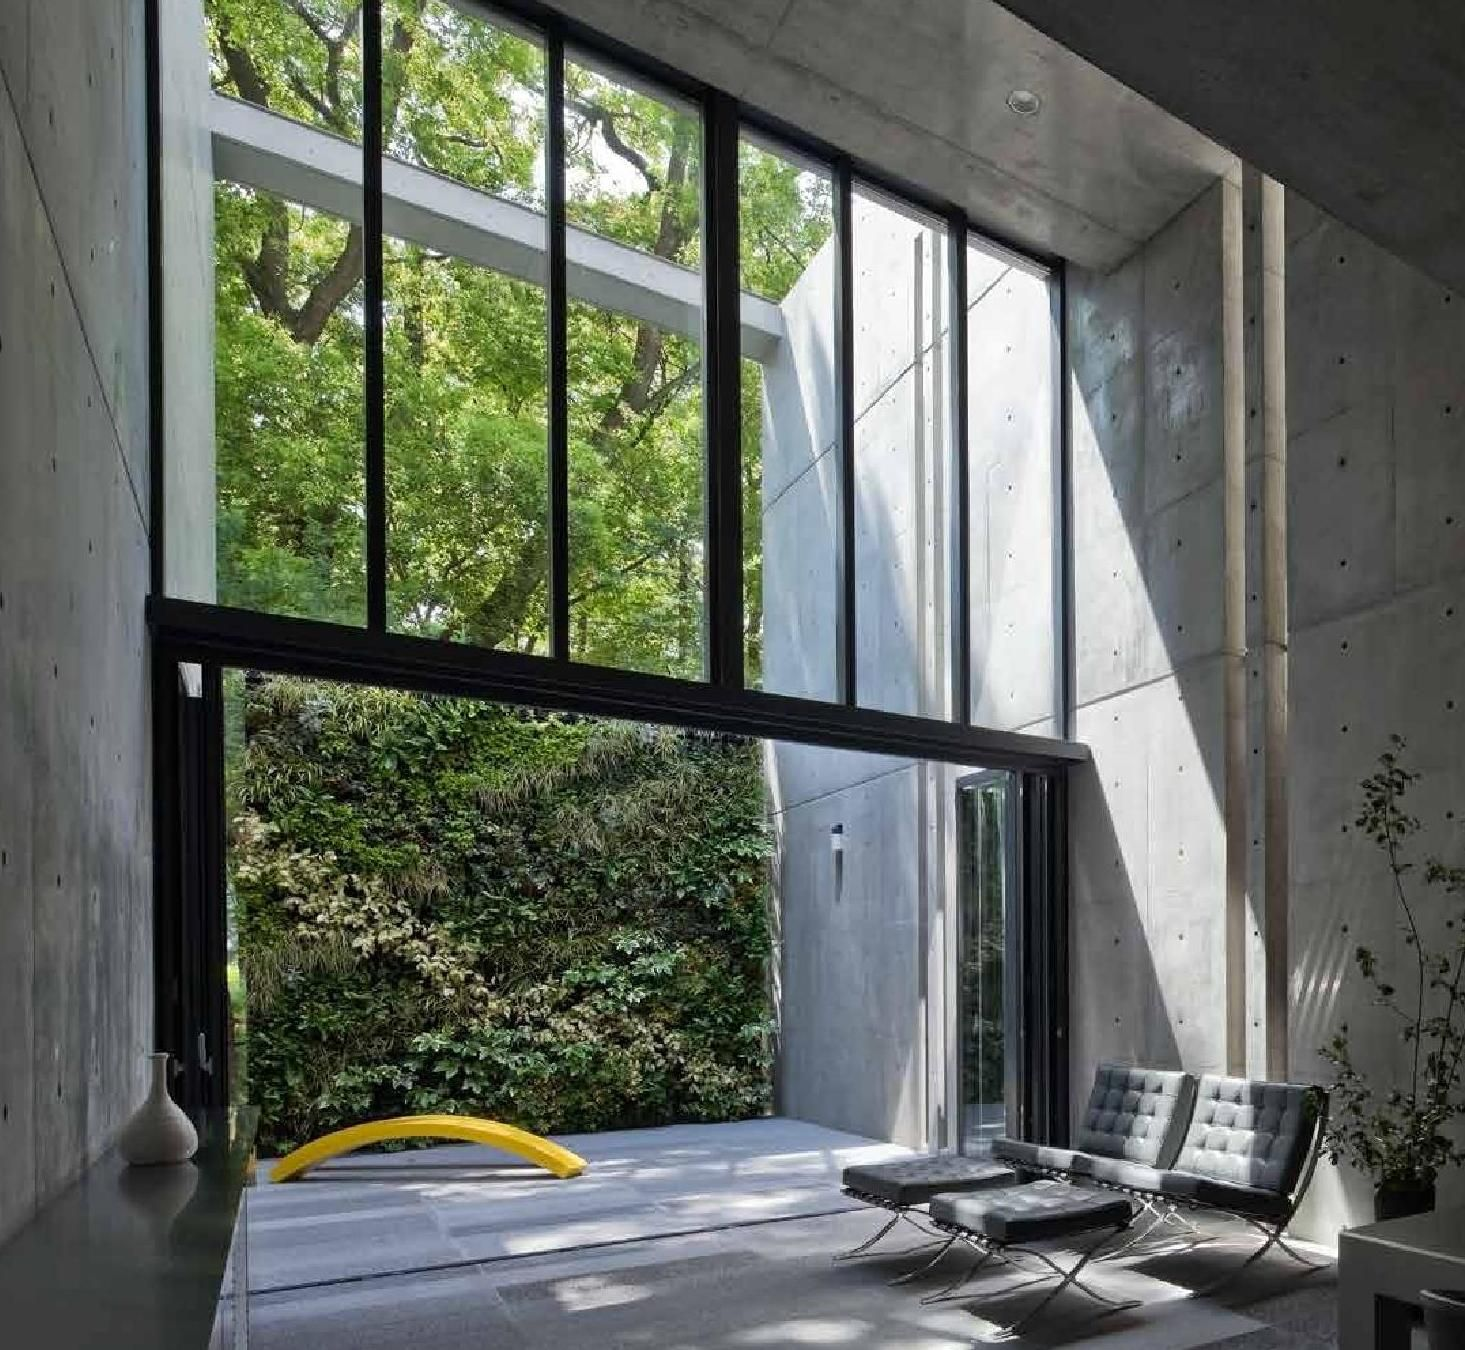 Tadao ando houses s t r u c t u r e s minimalist - Interior and exterior design definition ...